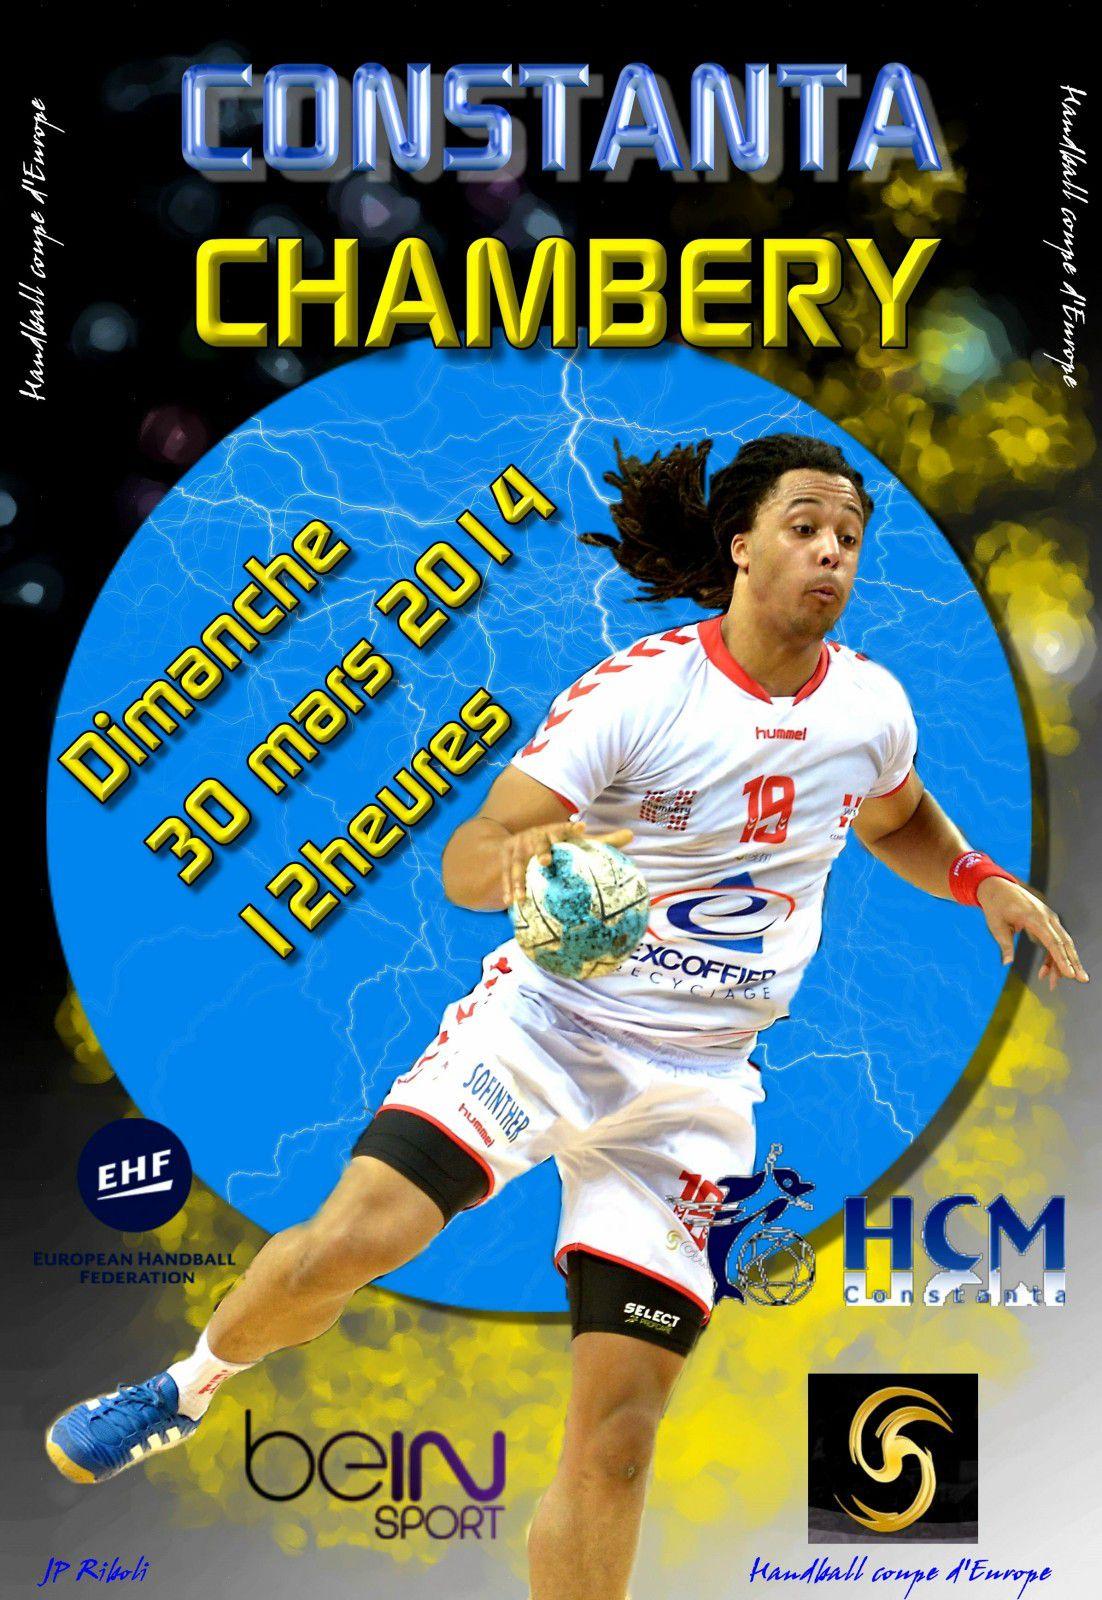 Affiche-EHF-CONSTANTA-CHAMBERY-30-mars-2014-N-2.jpg